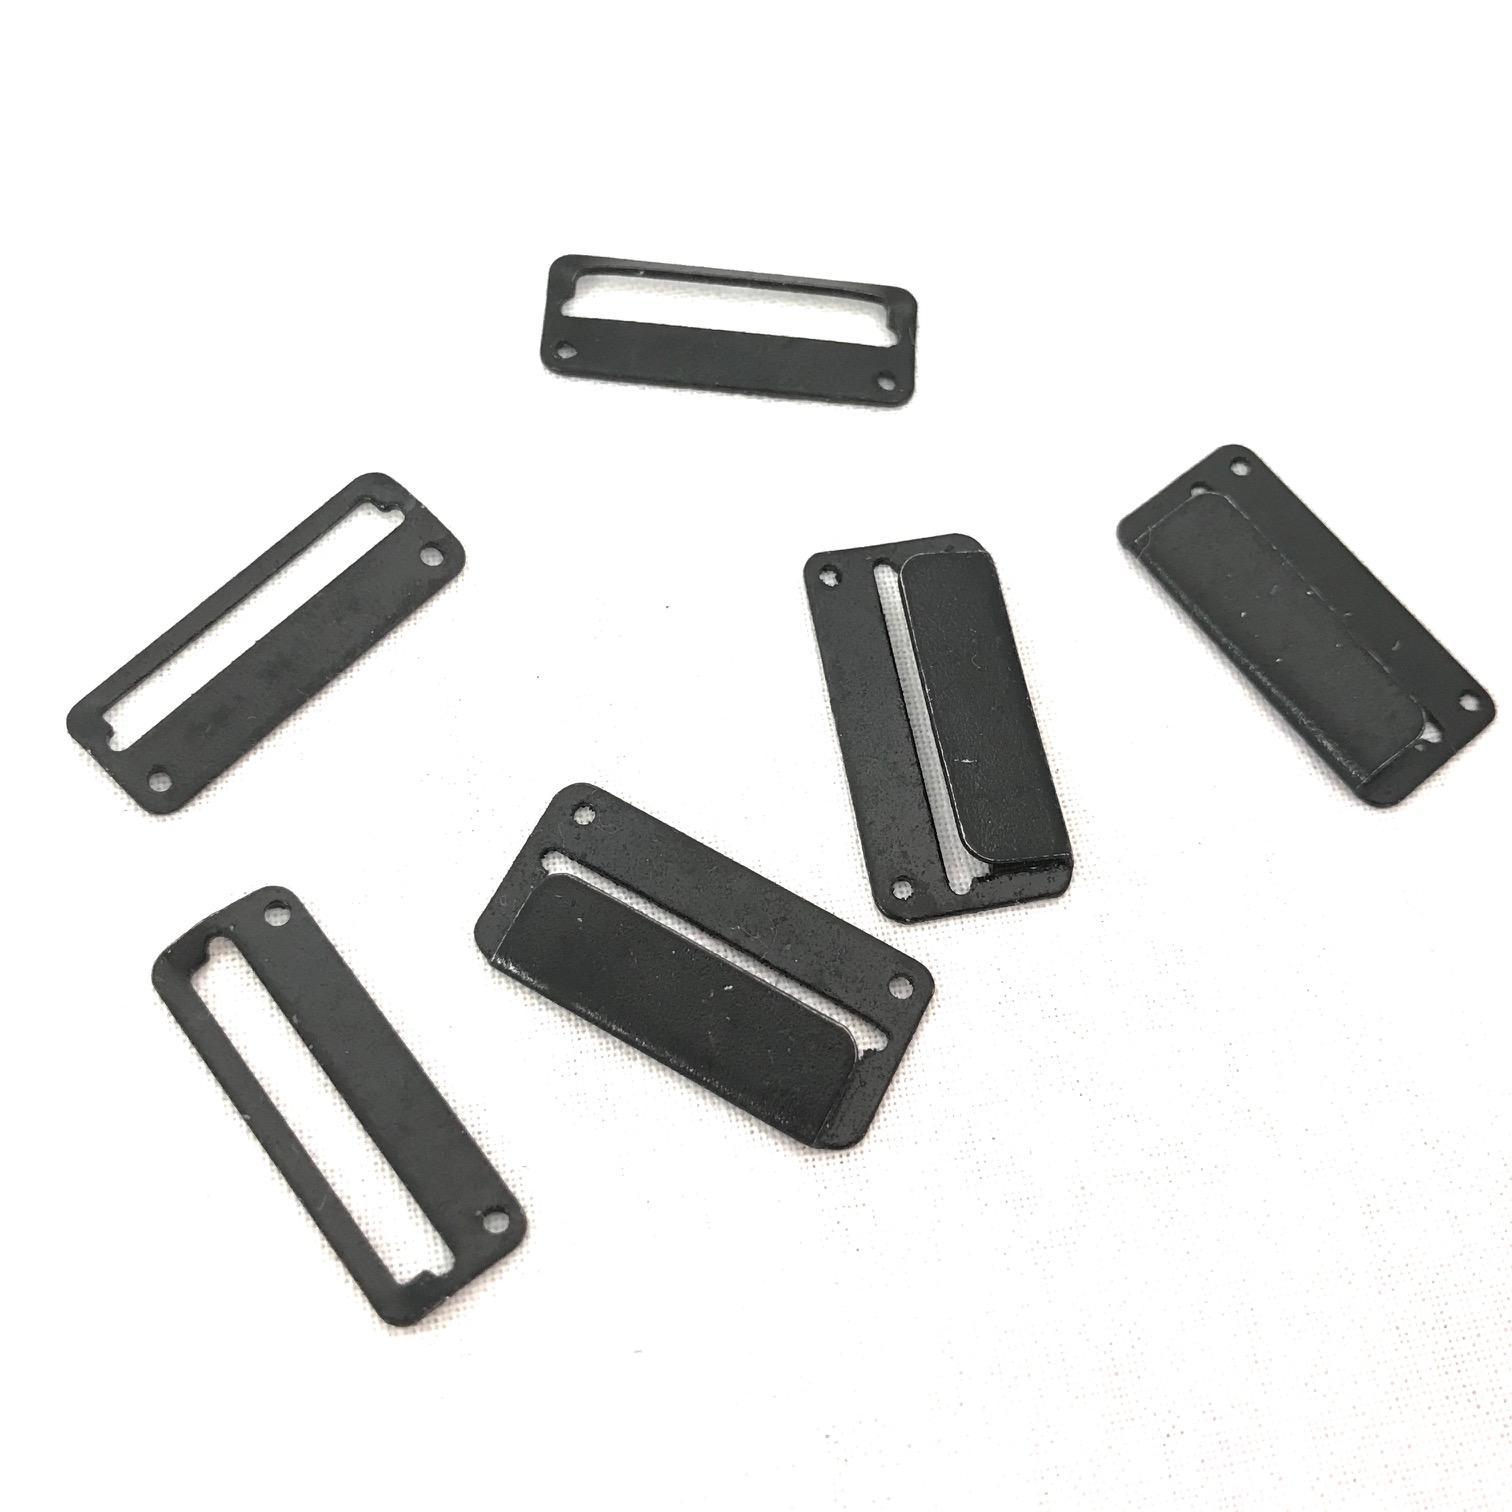 Agrafes jupe noir 25mm mercerie couture